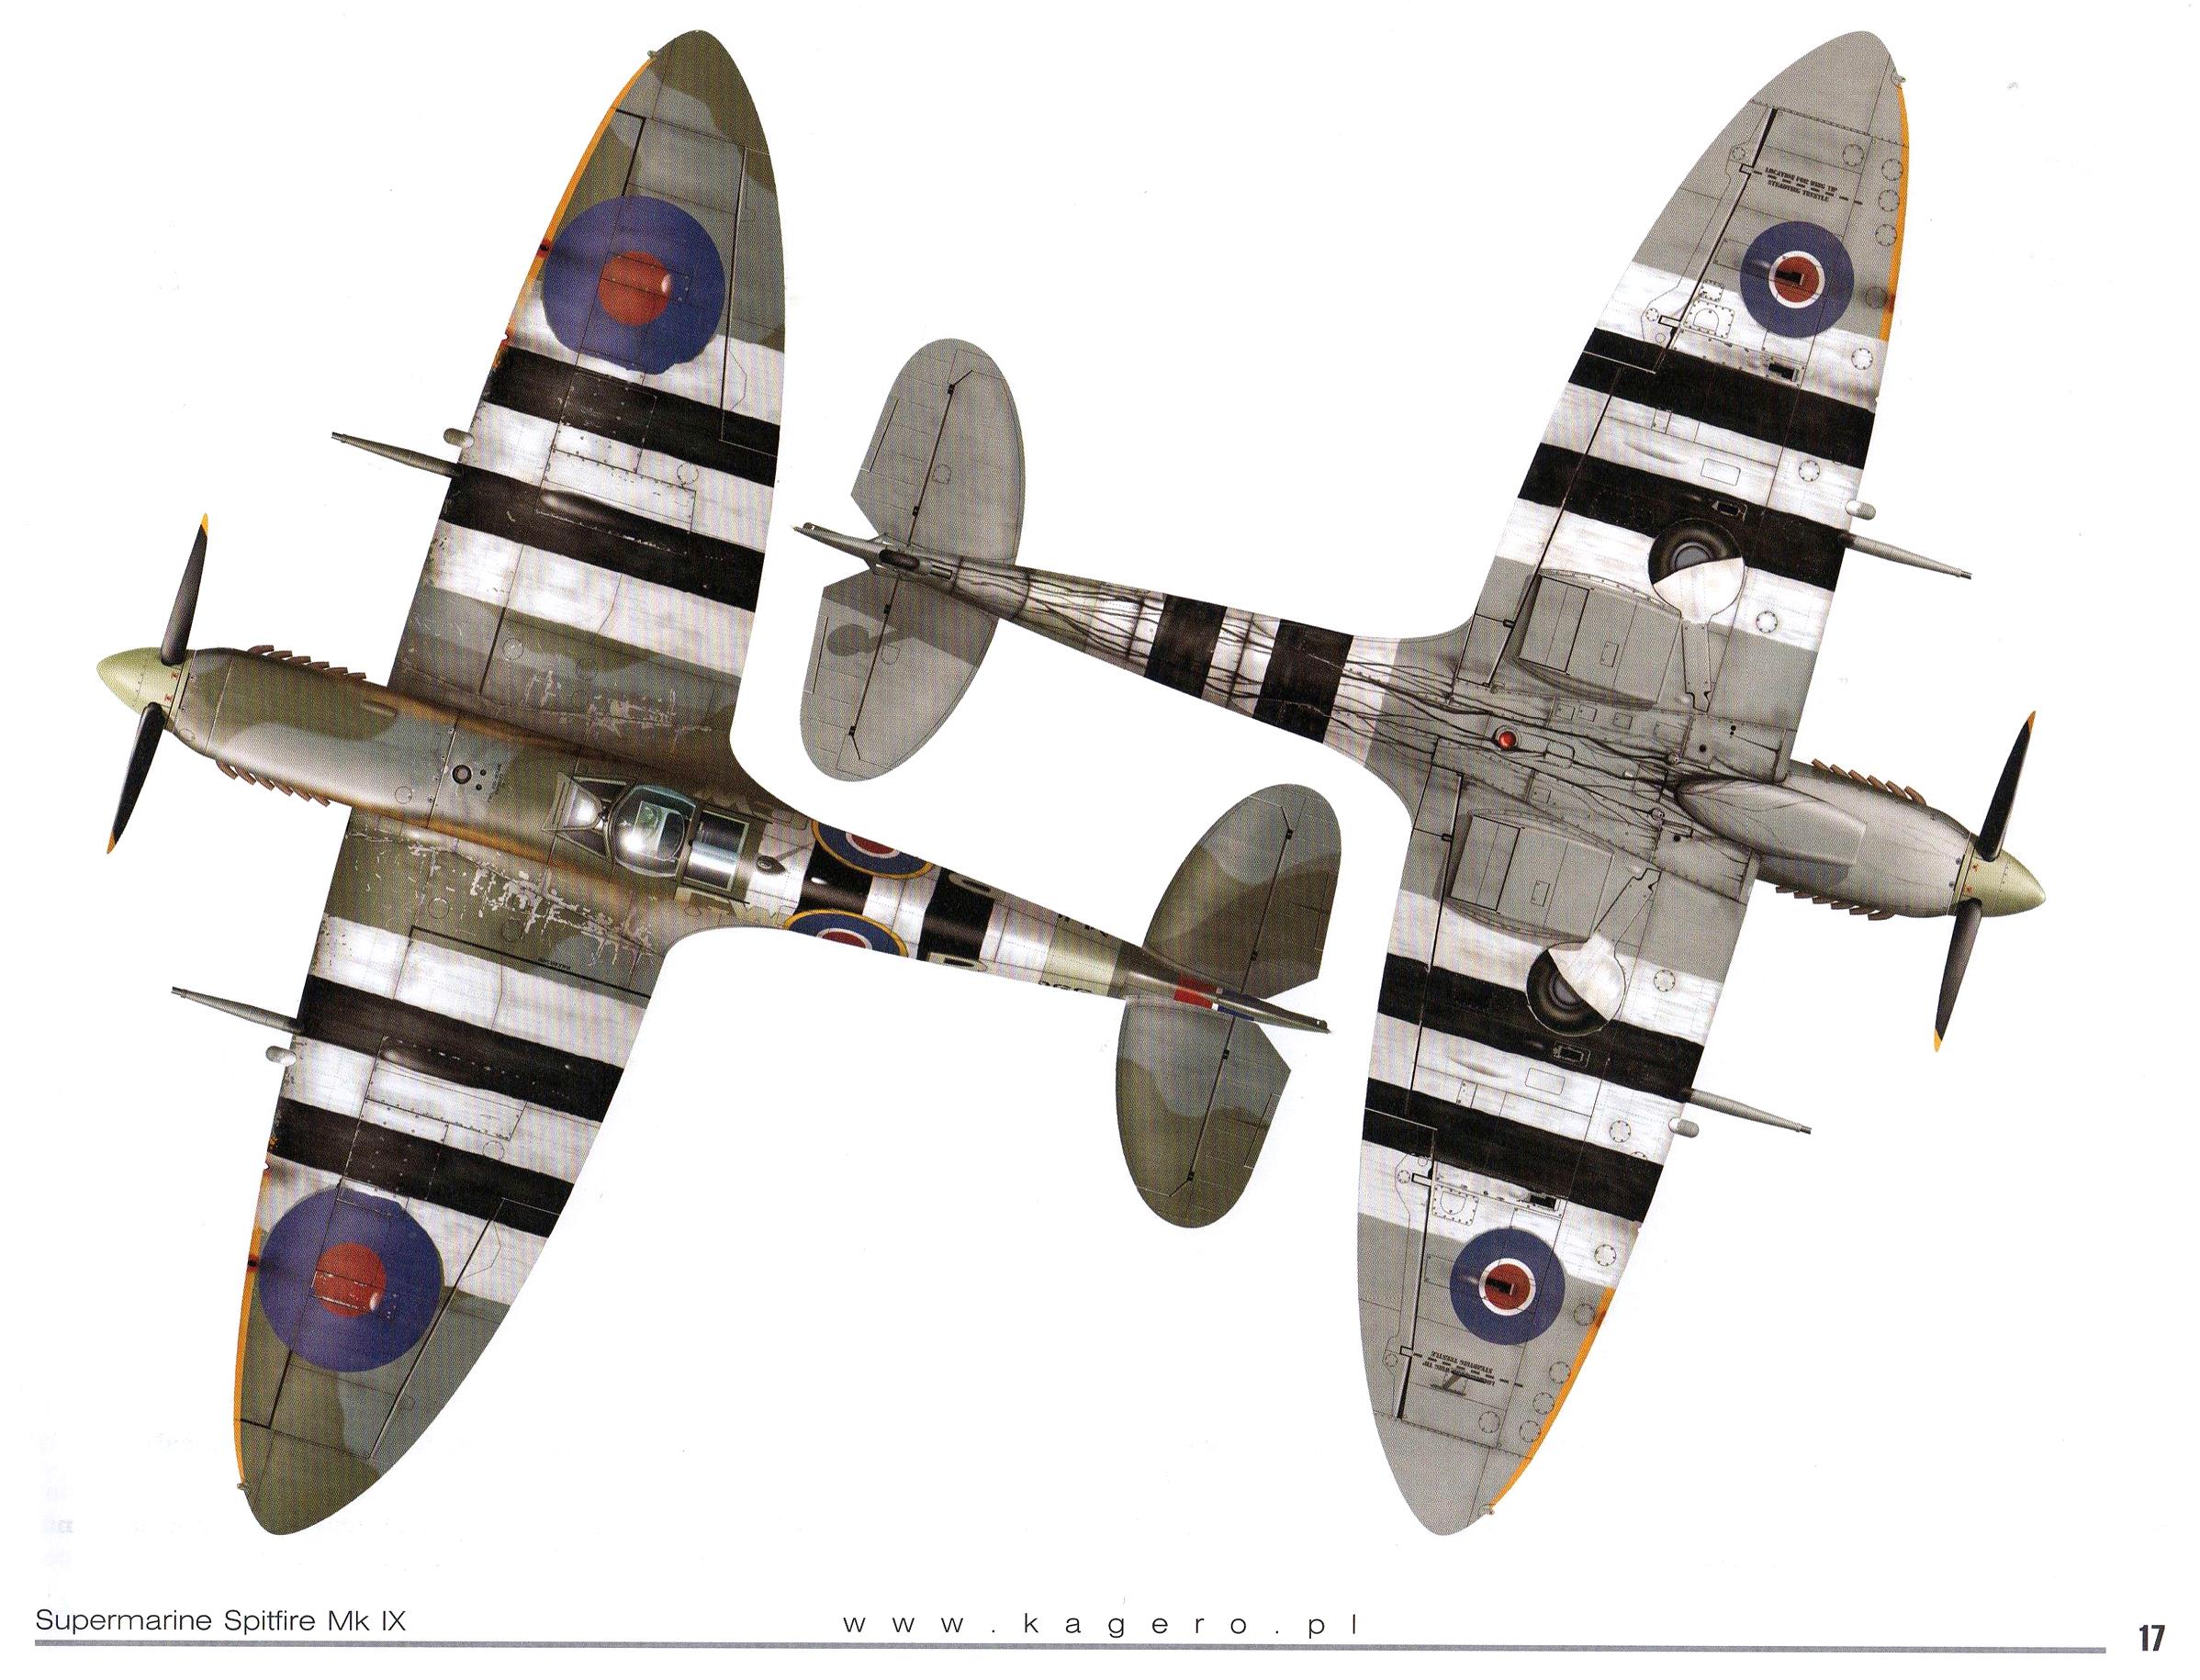 Spitfire MkIXc RAF 340Sqn GWB Denys Boudard MJ966 TC15015 Supermarine Spitfire MkIX Page 17